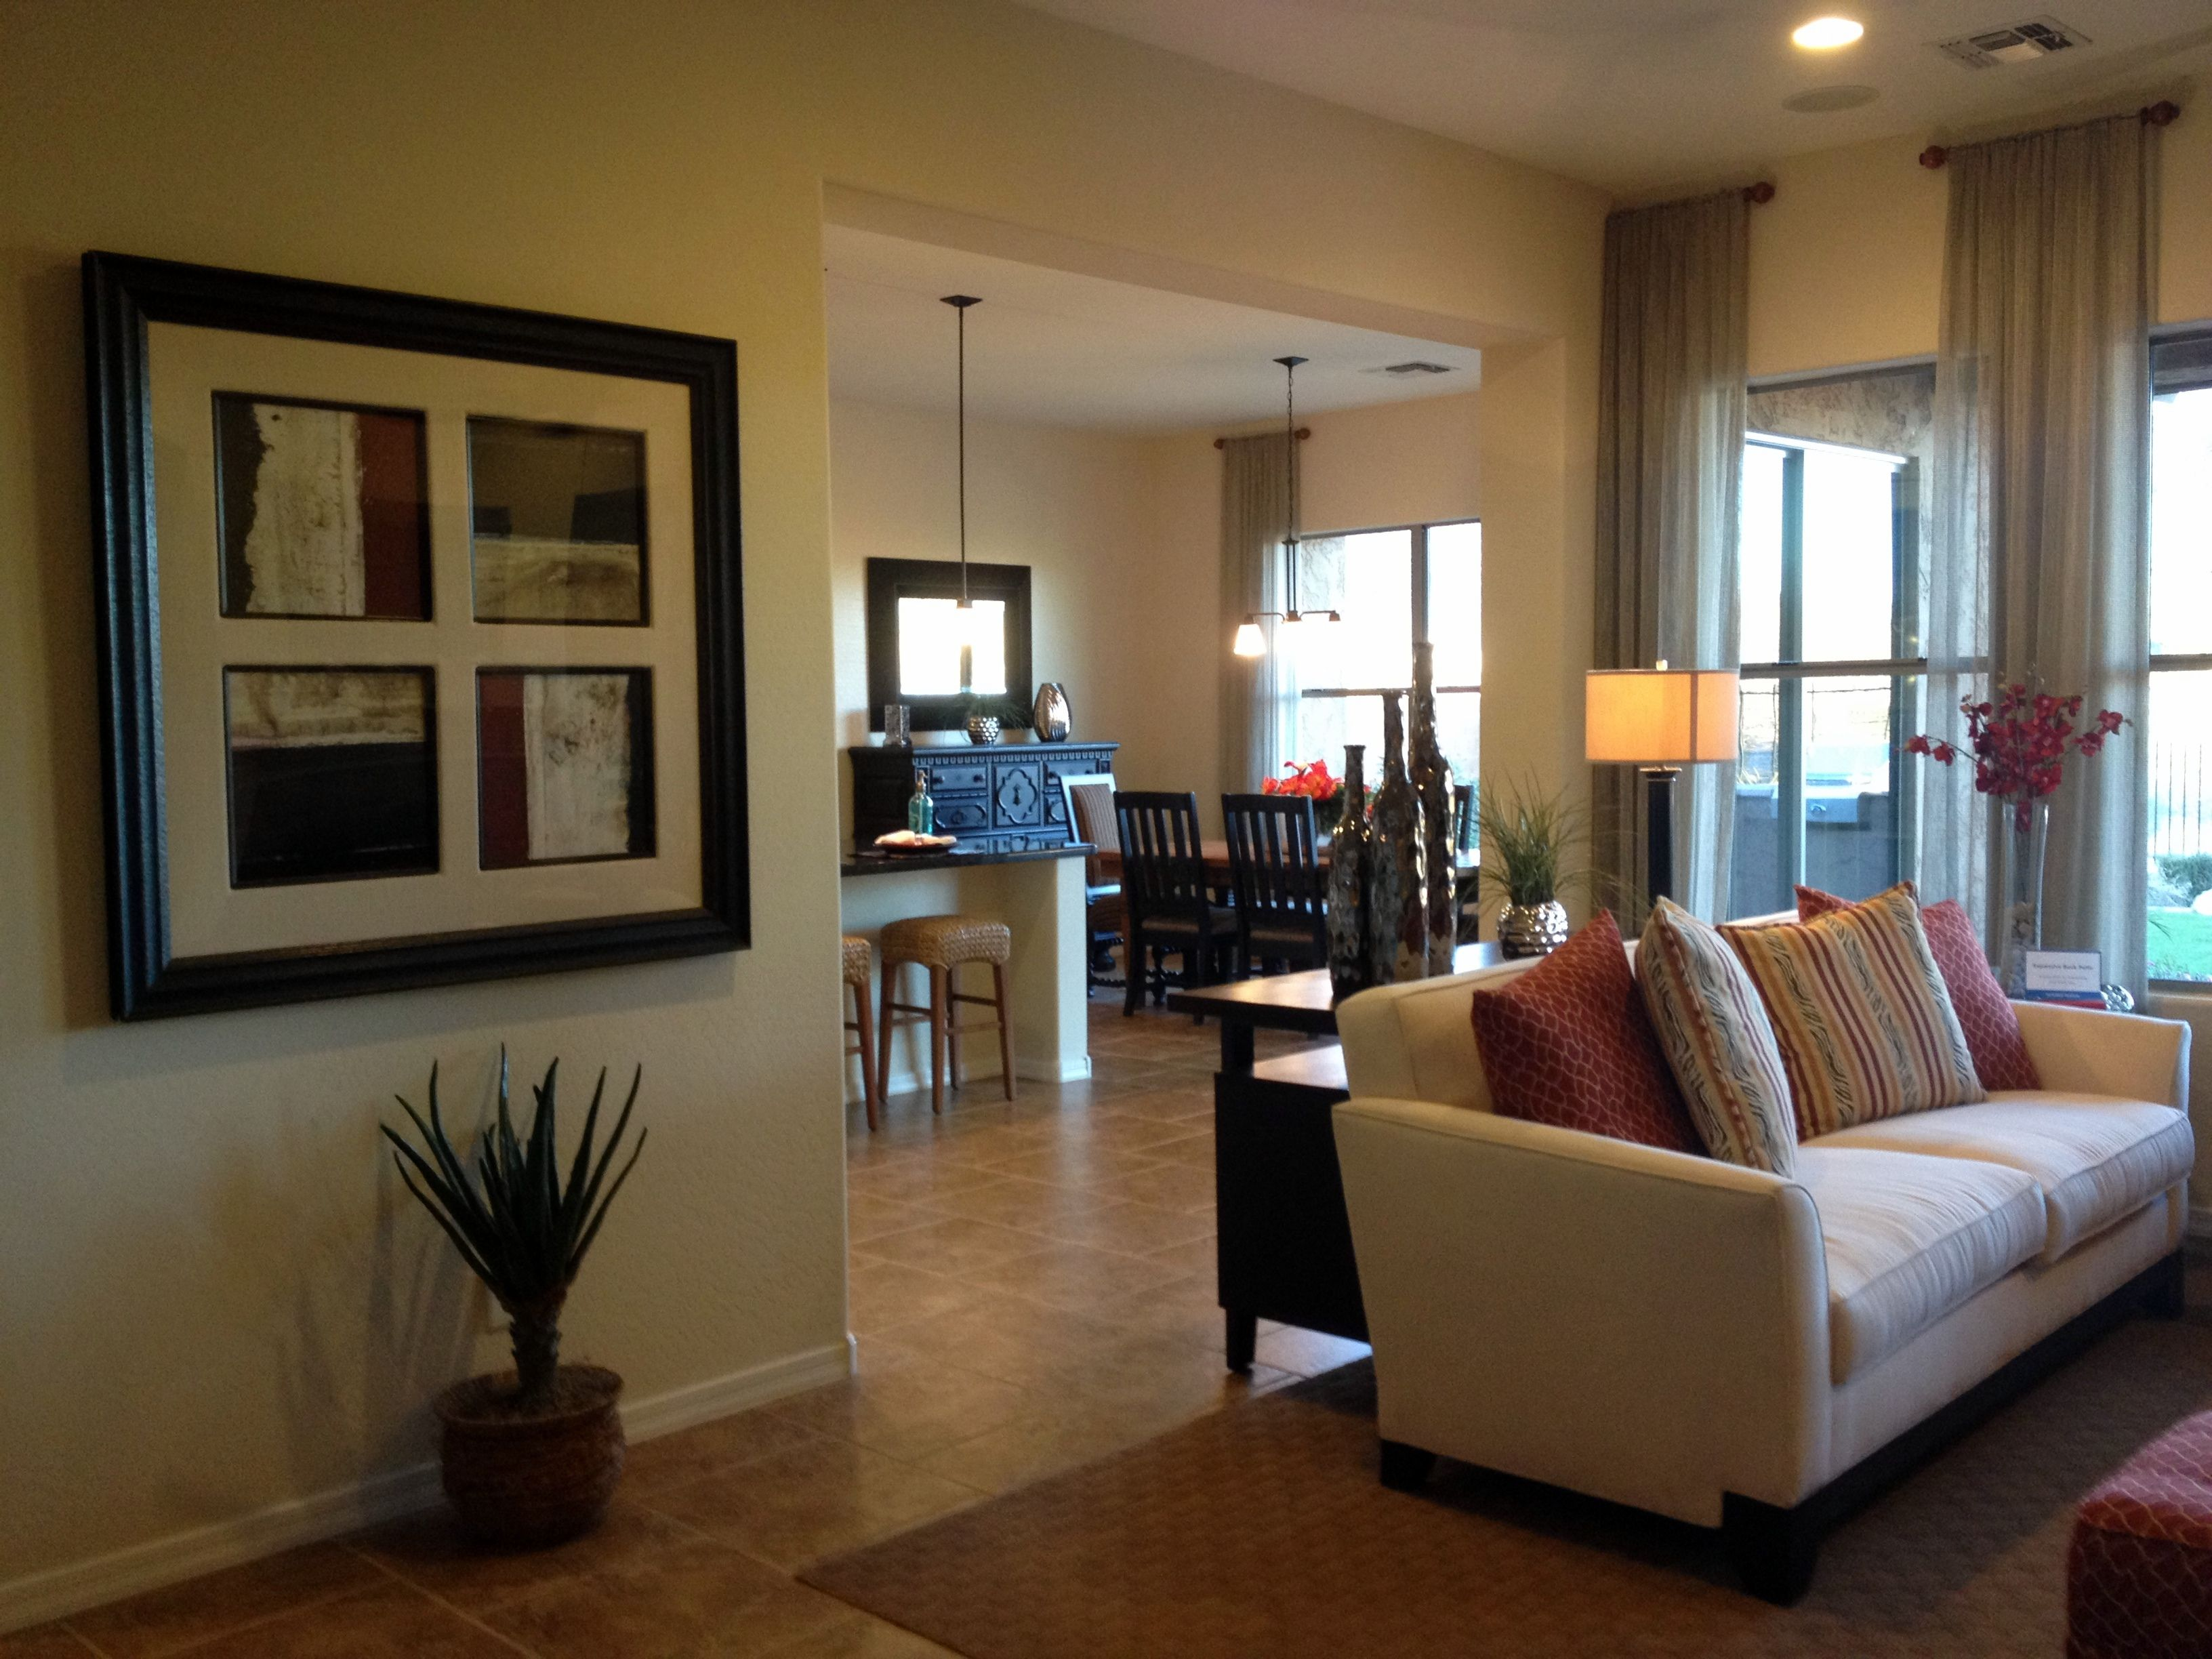 New Homes For Sale In Verrado Buckeye Az